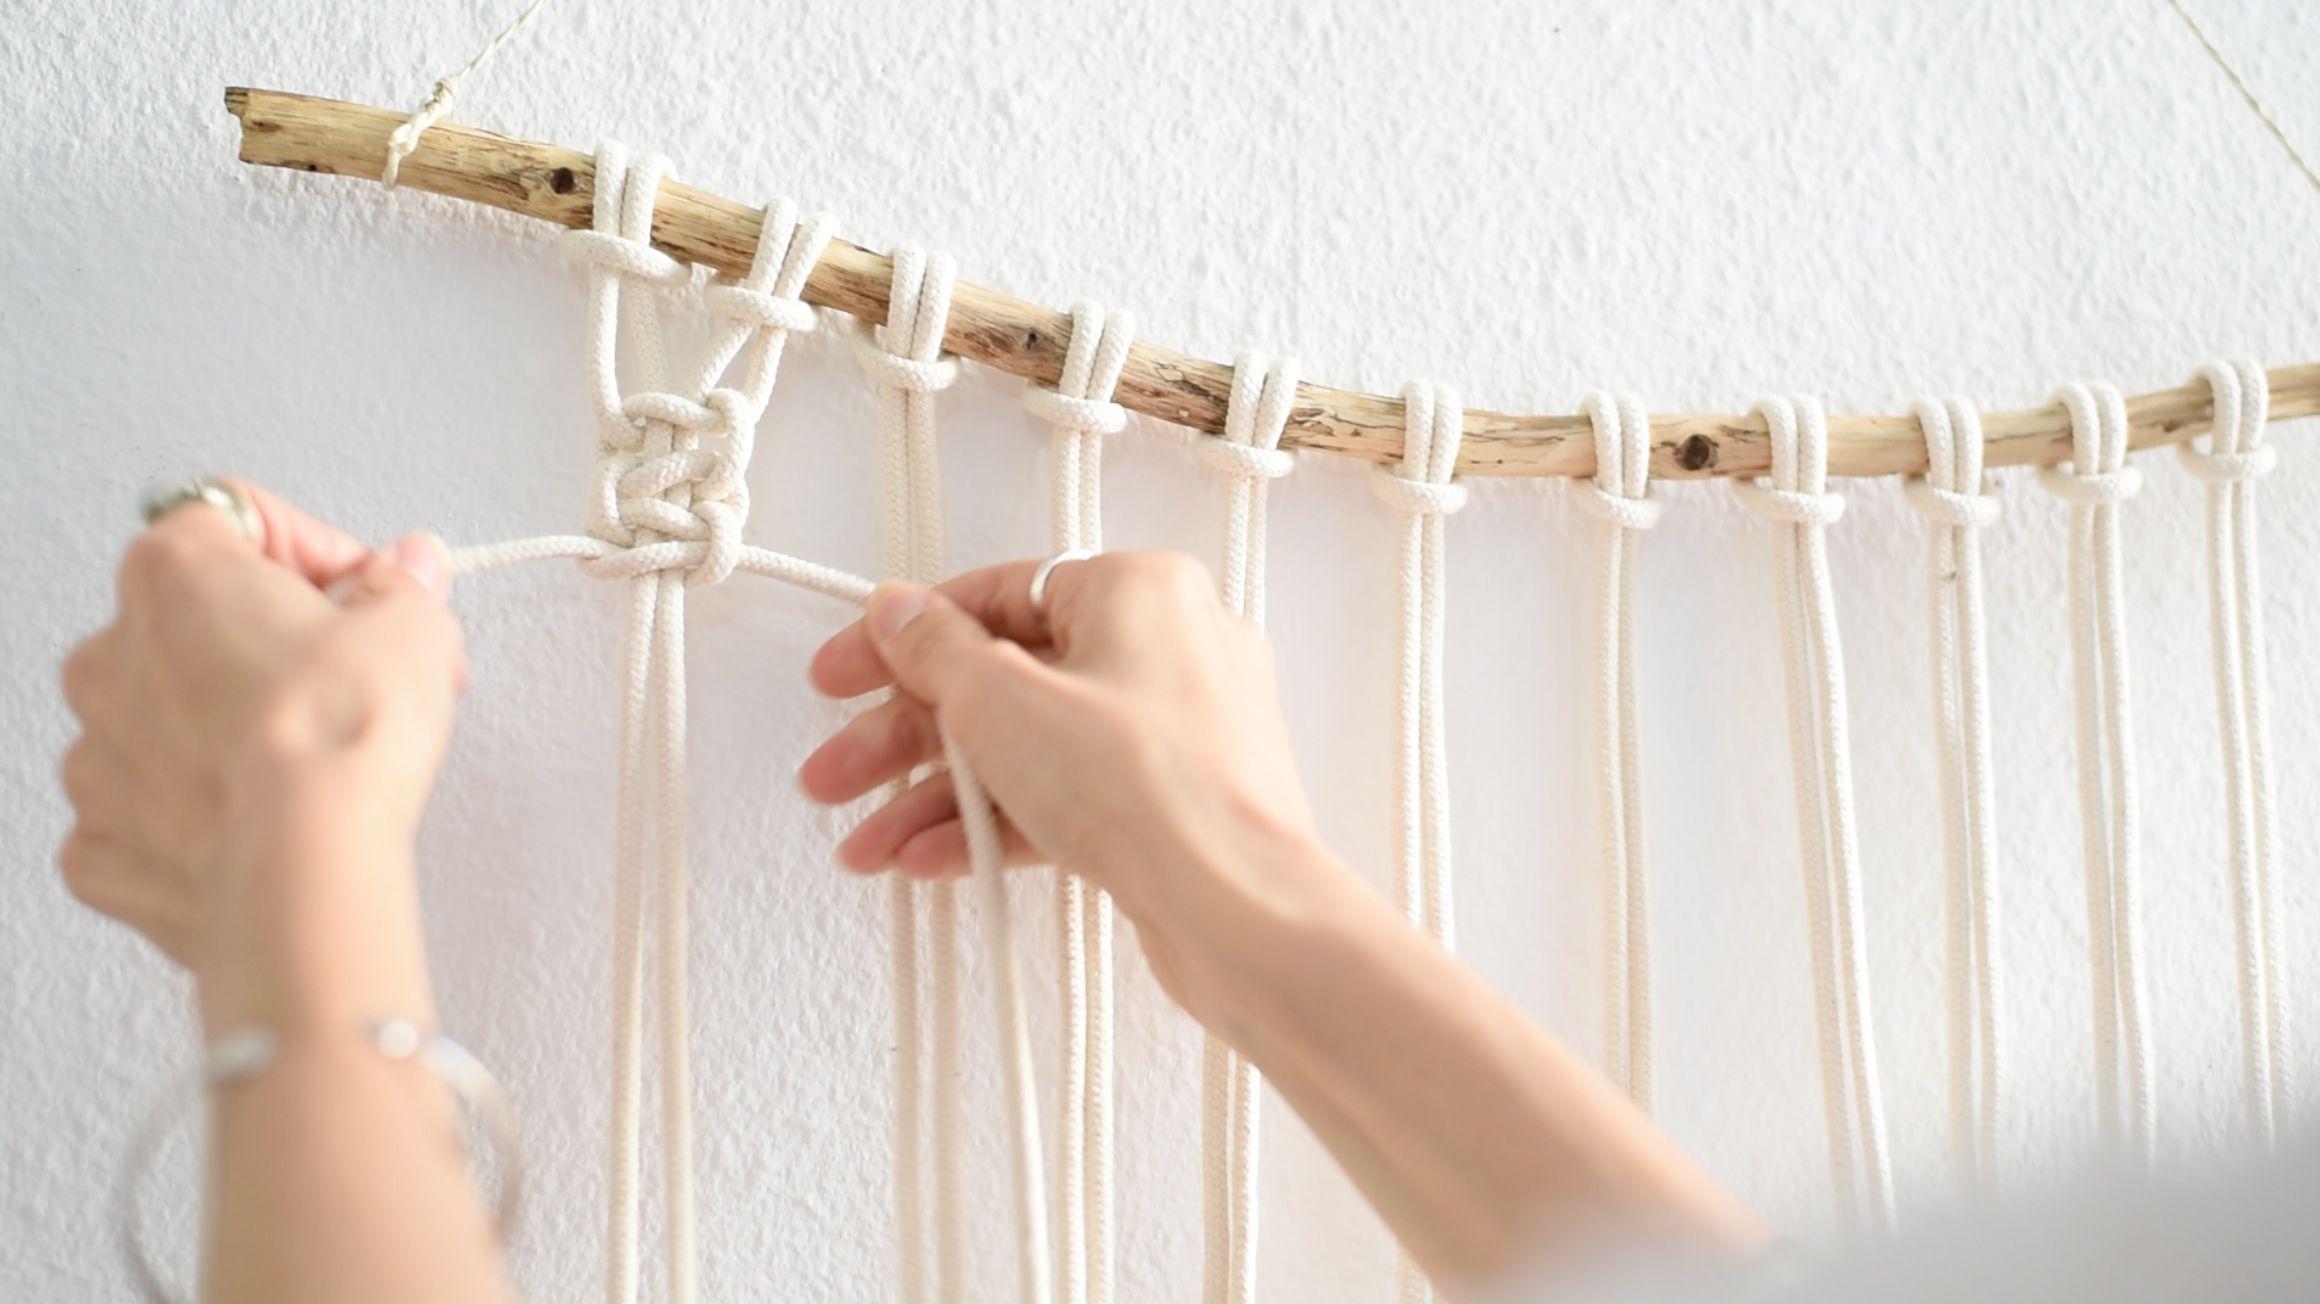 Interior Super Easy Diy Macrame Wall Hanging Tutorial Heylilahey Macrame Wall Hanging Tutorial Macrame Wall Hanging Macrame Diy